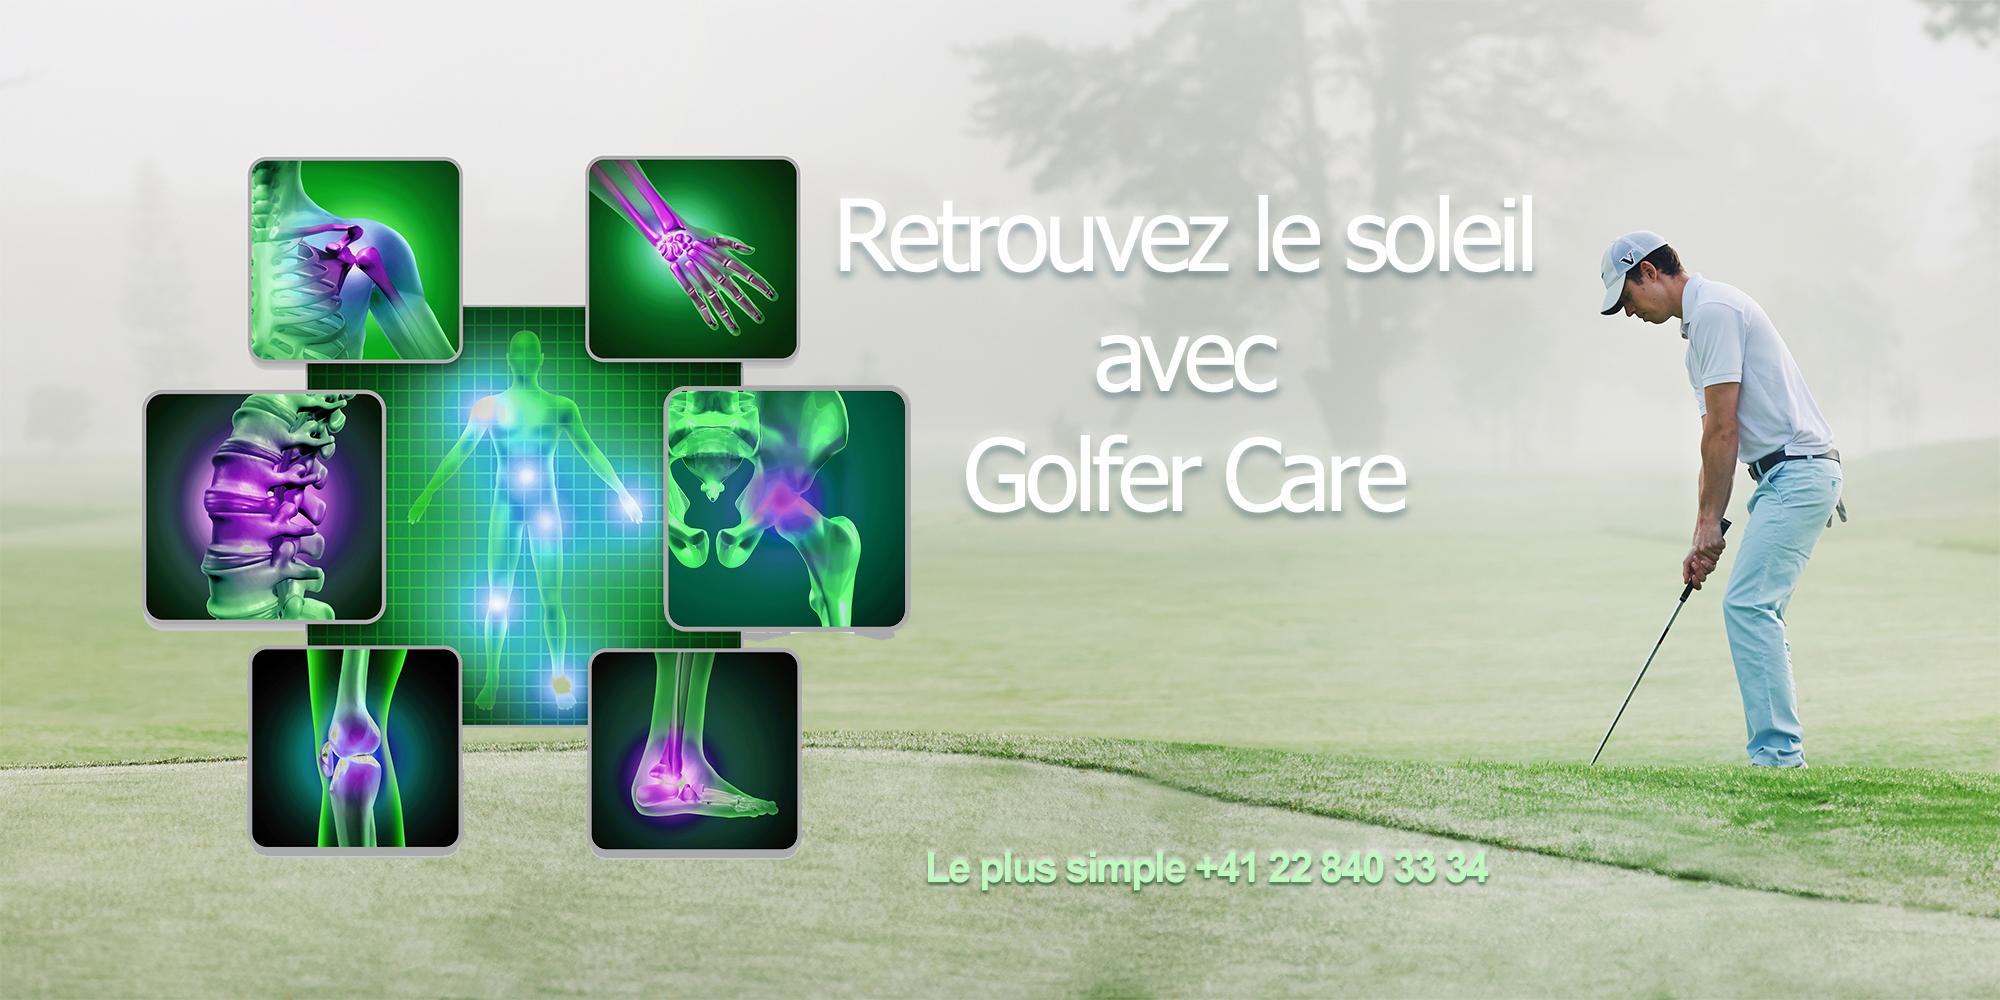 Golfer Care soleil